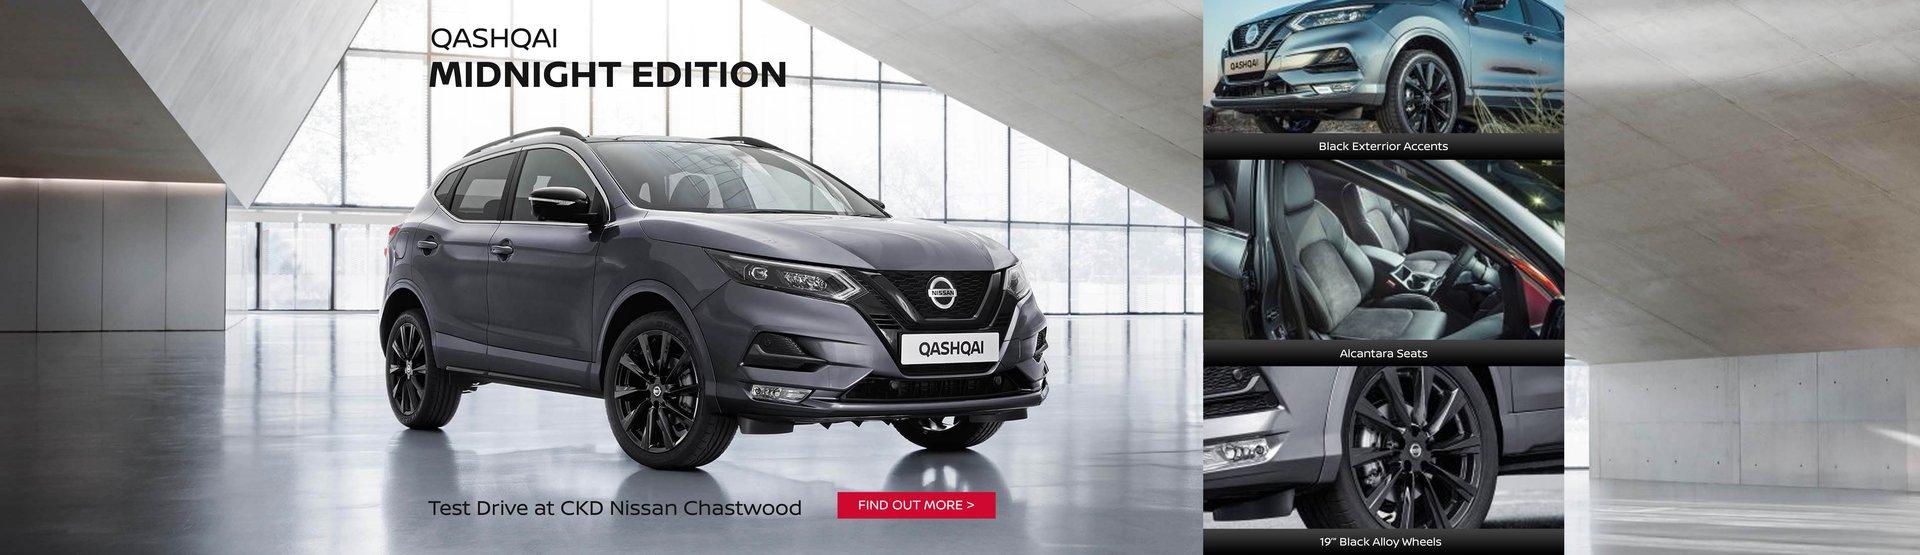 CKD Nissan Chatswood l Qashqai